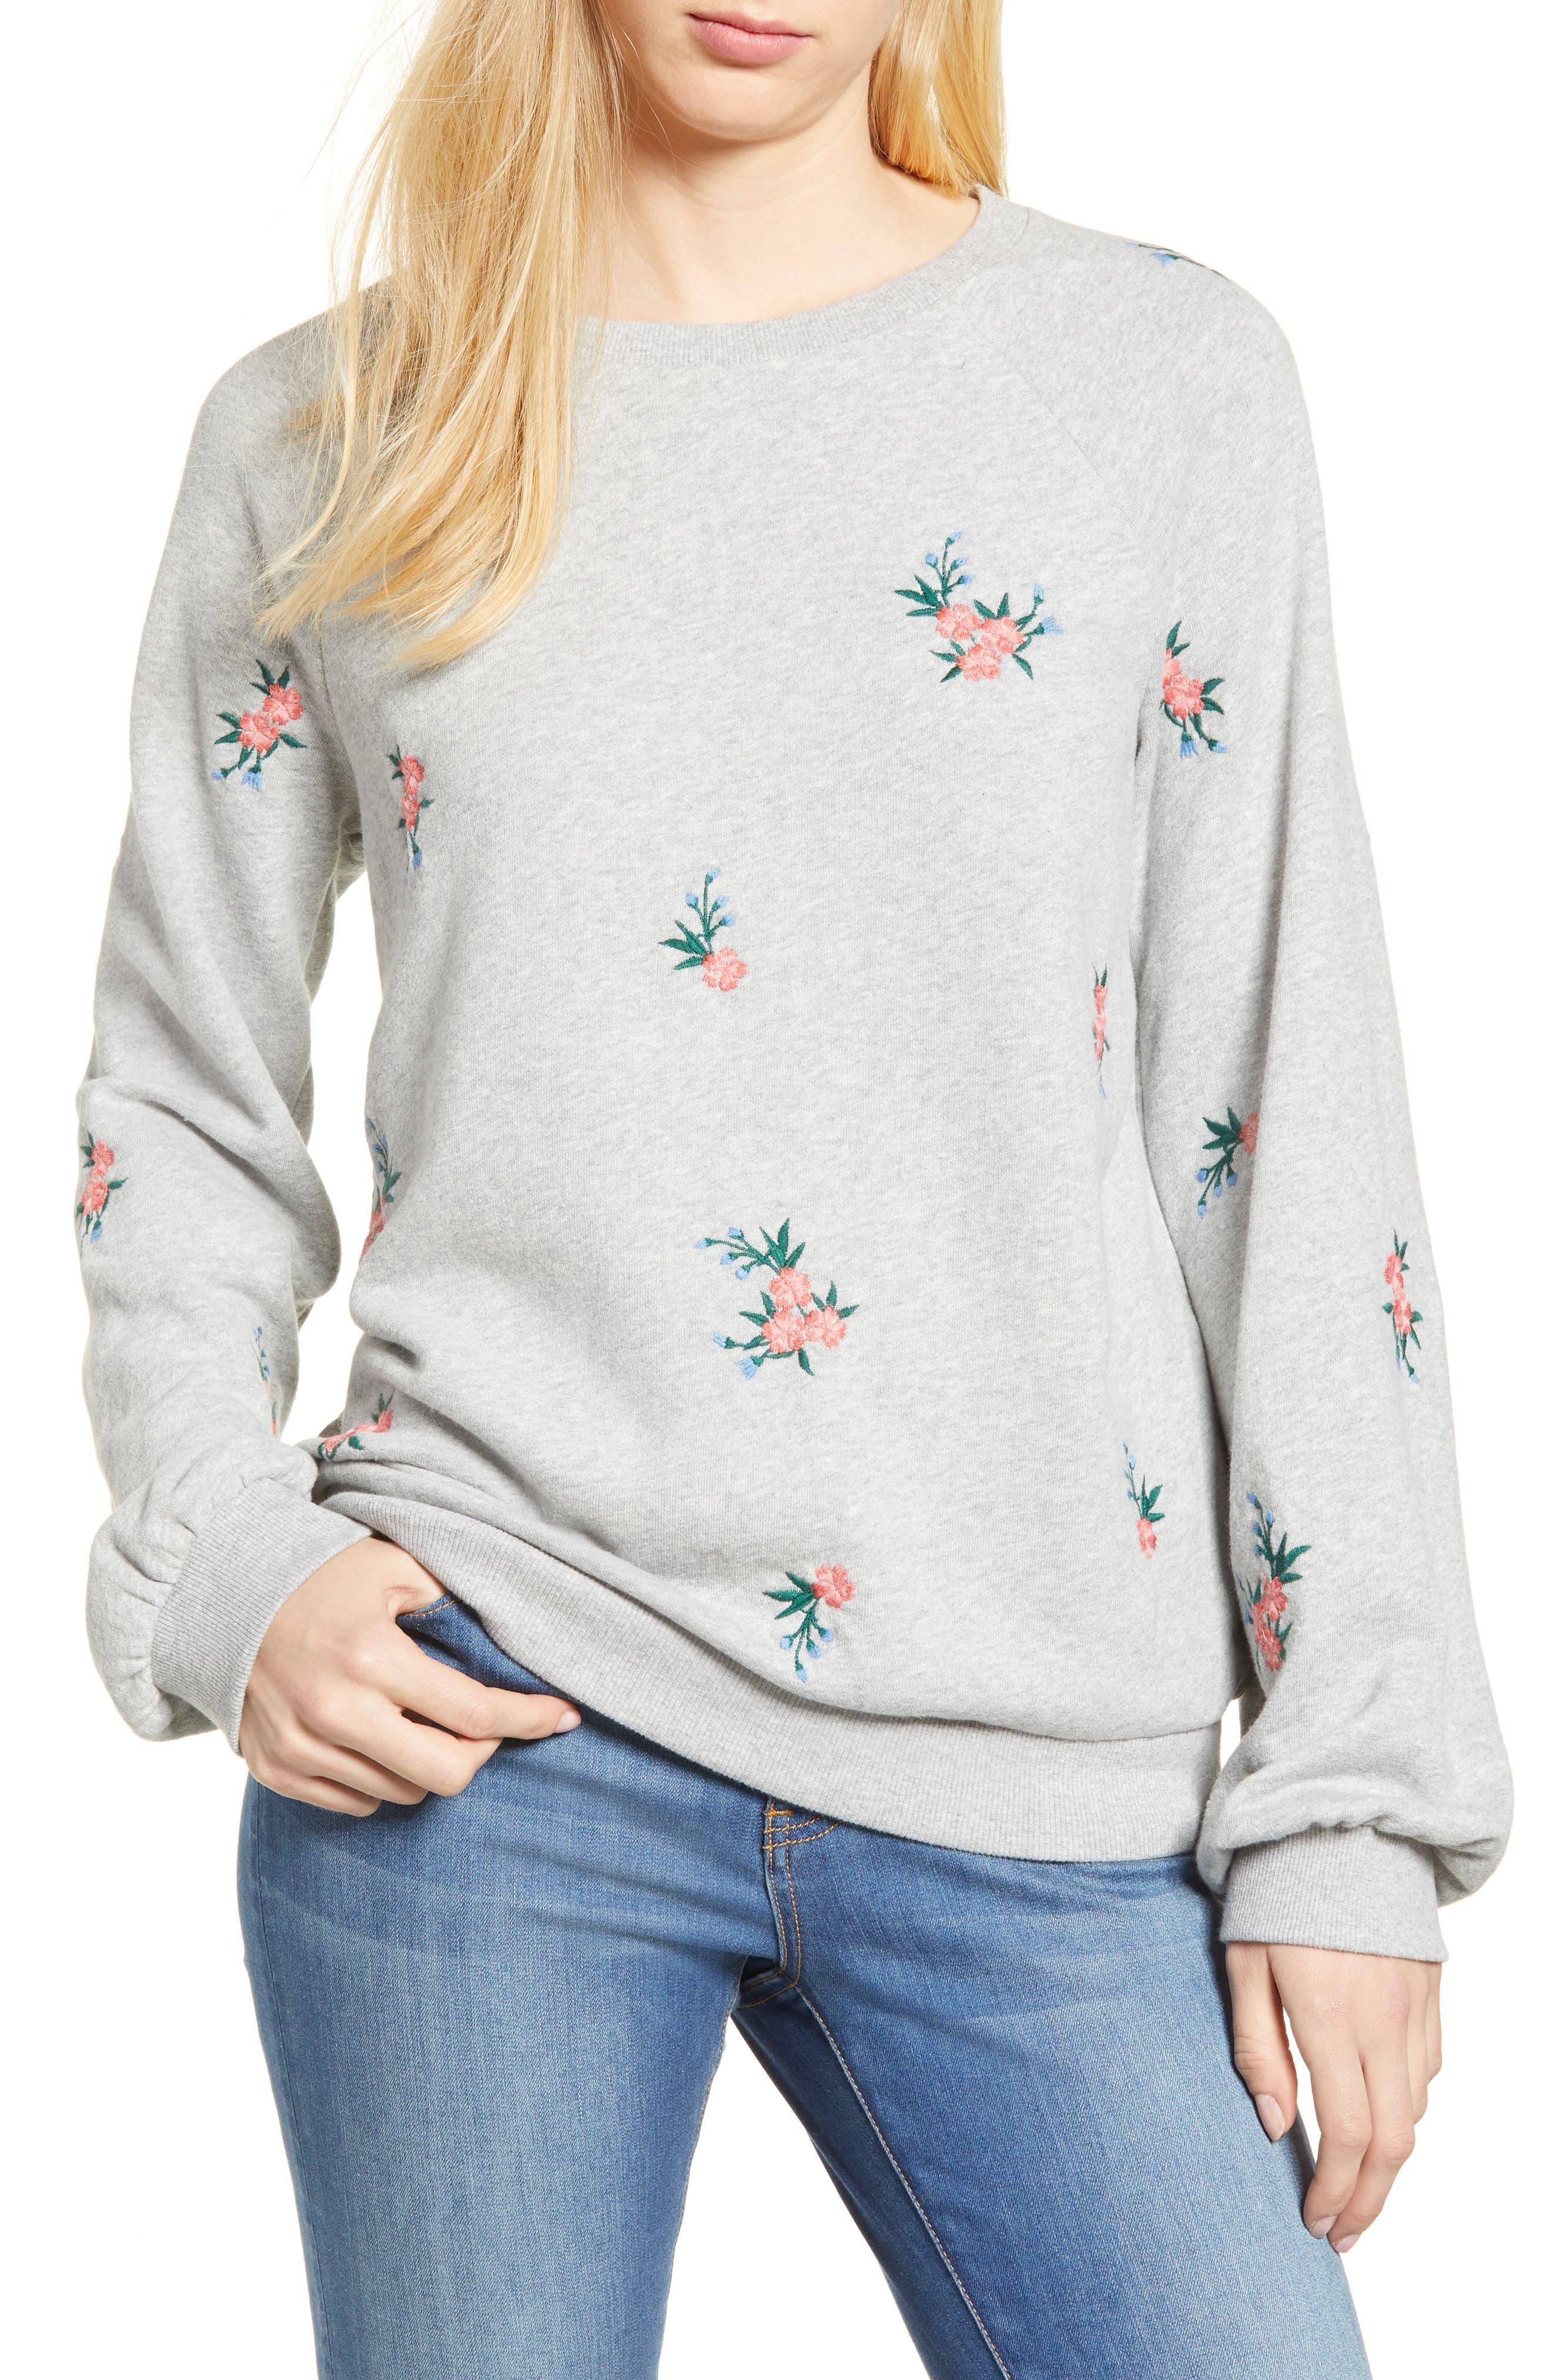 Embroidered Sweatshirt,                             Main thumbnail 1, color,                             030